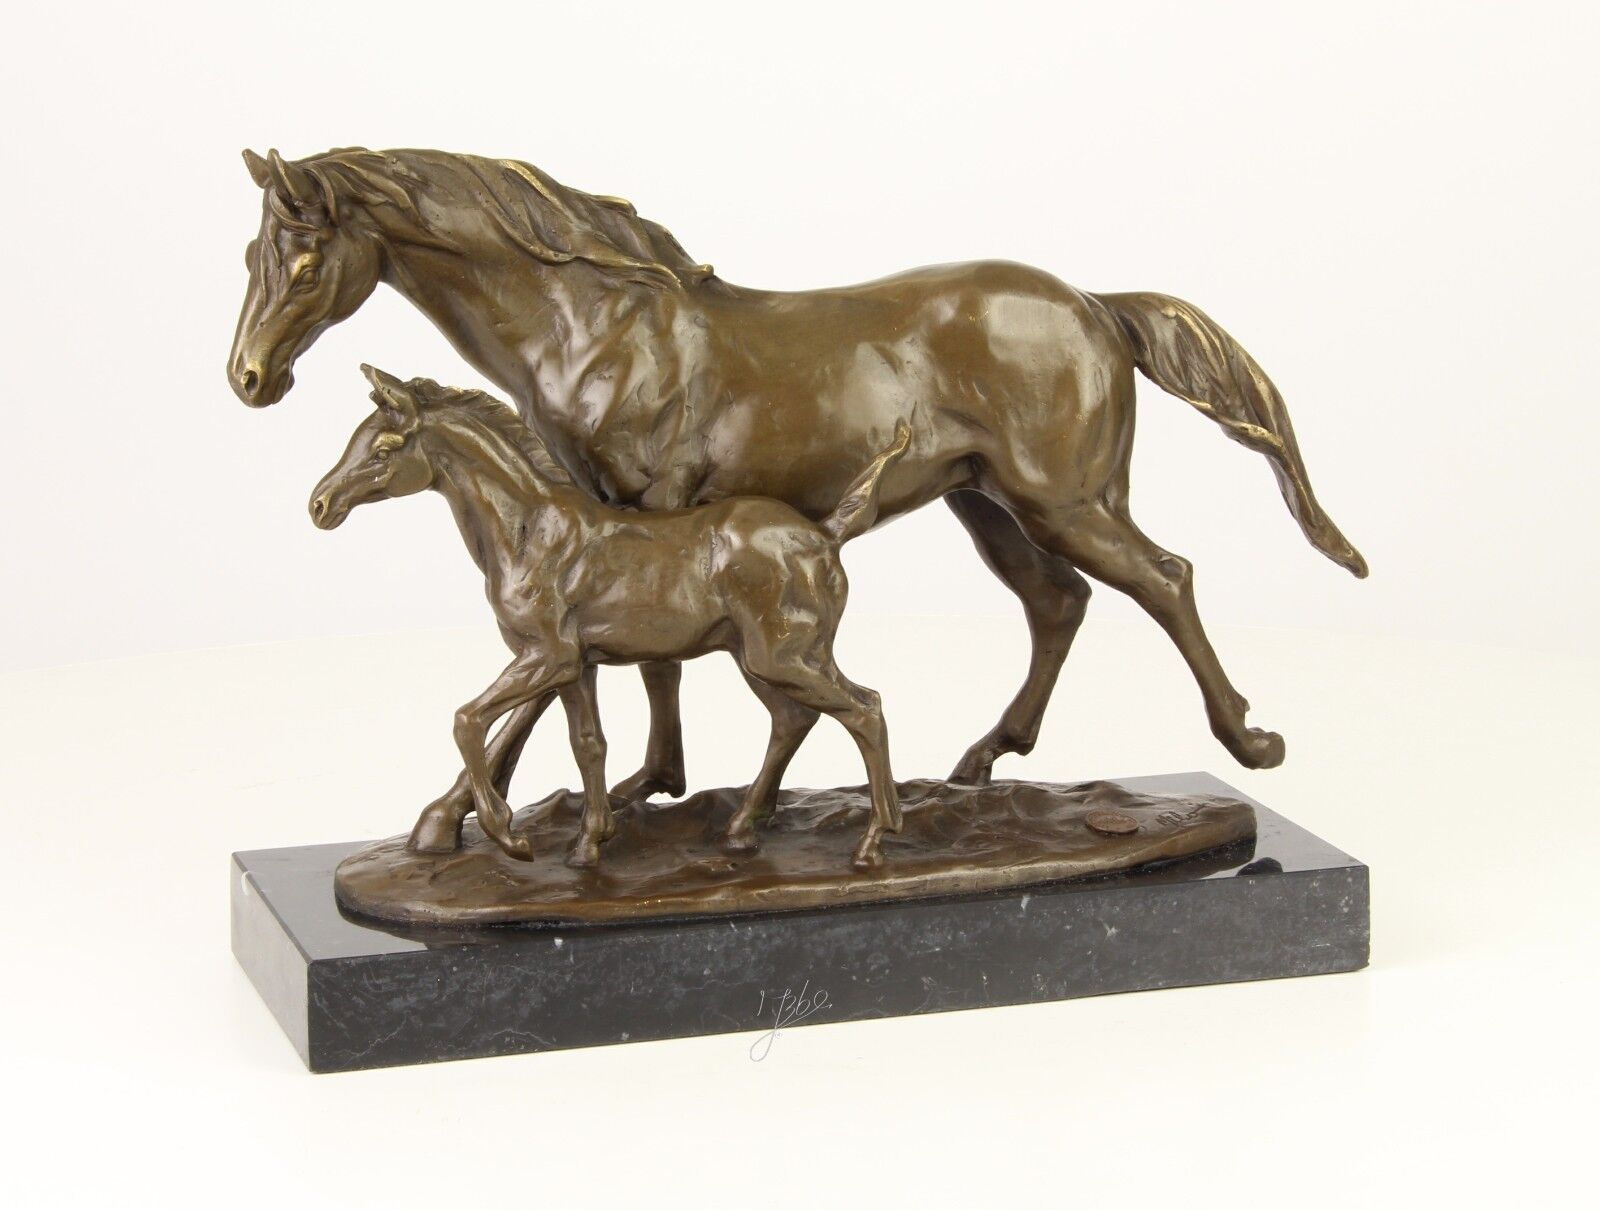 Bronze-Skulptur Pferd Stute mit Fohlen neu 9973256-dsp